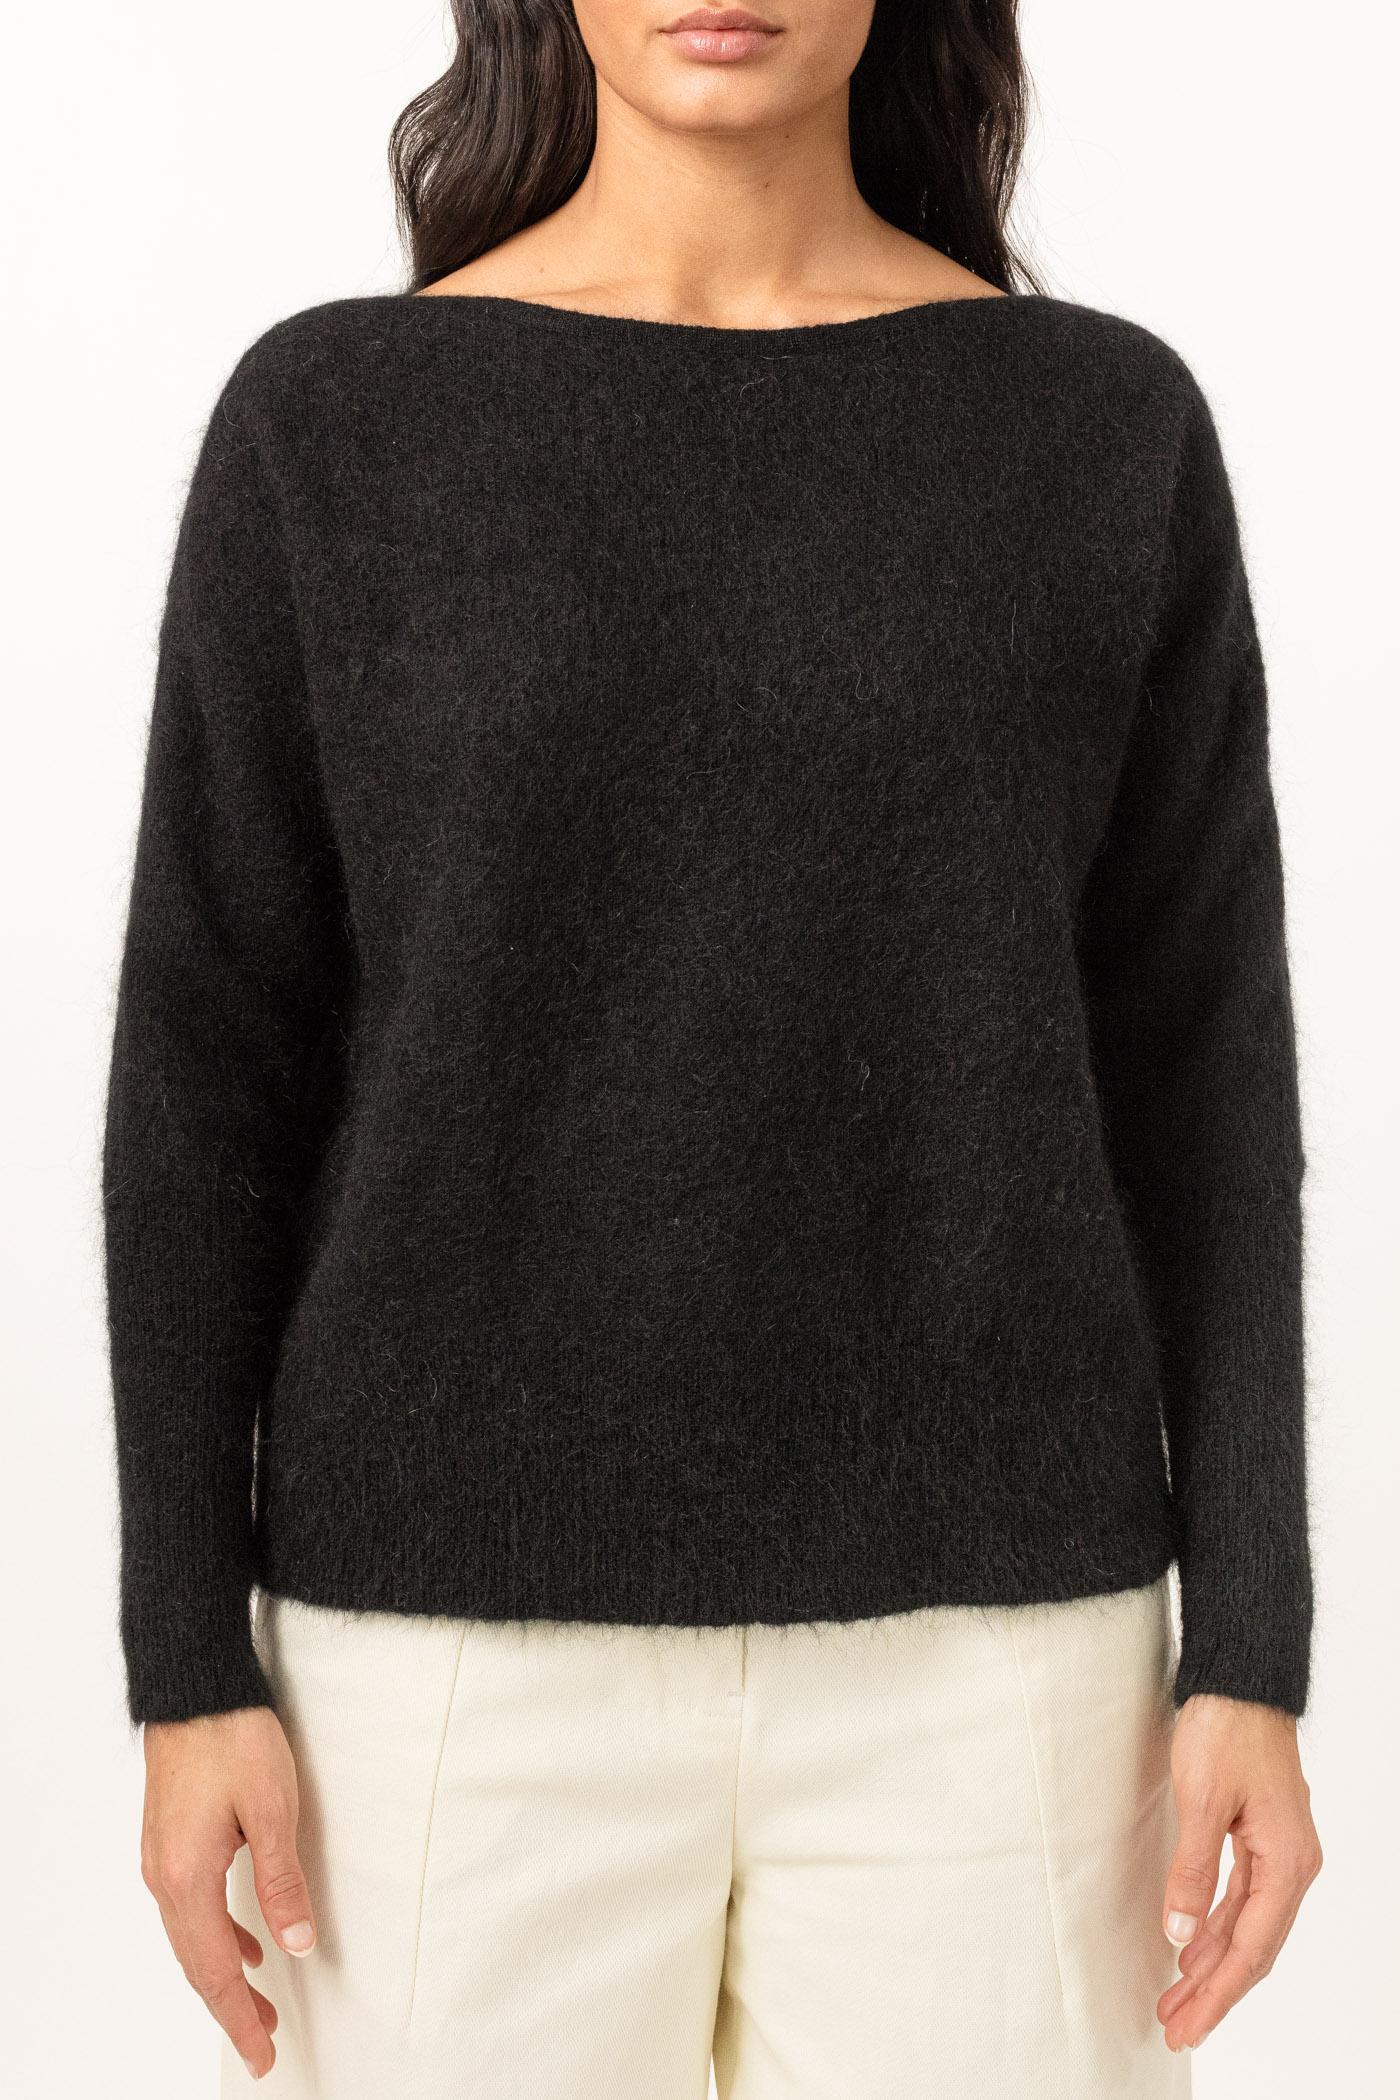 Lys beige eller sort soft mohair genser med båthals Cathrine Hammel - soft wide crewneck